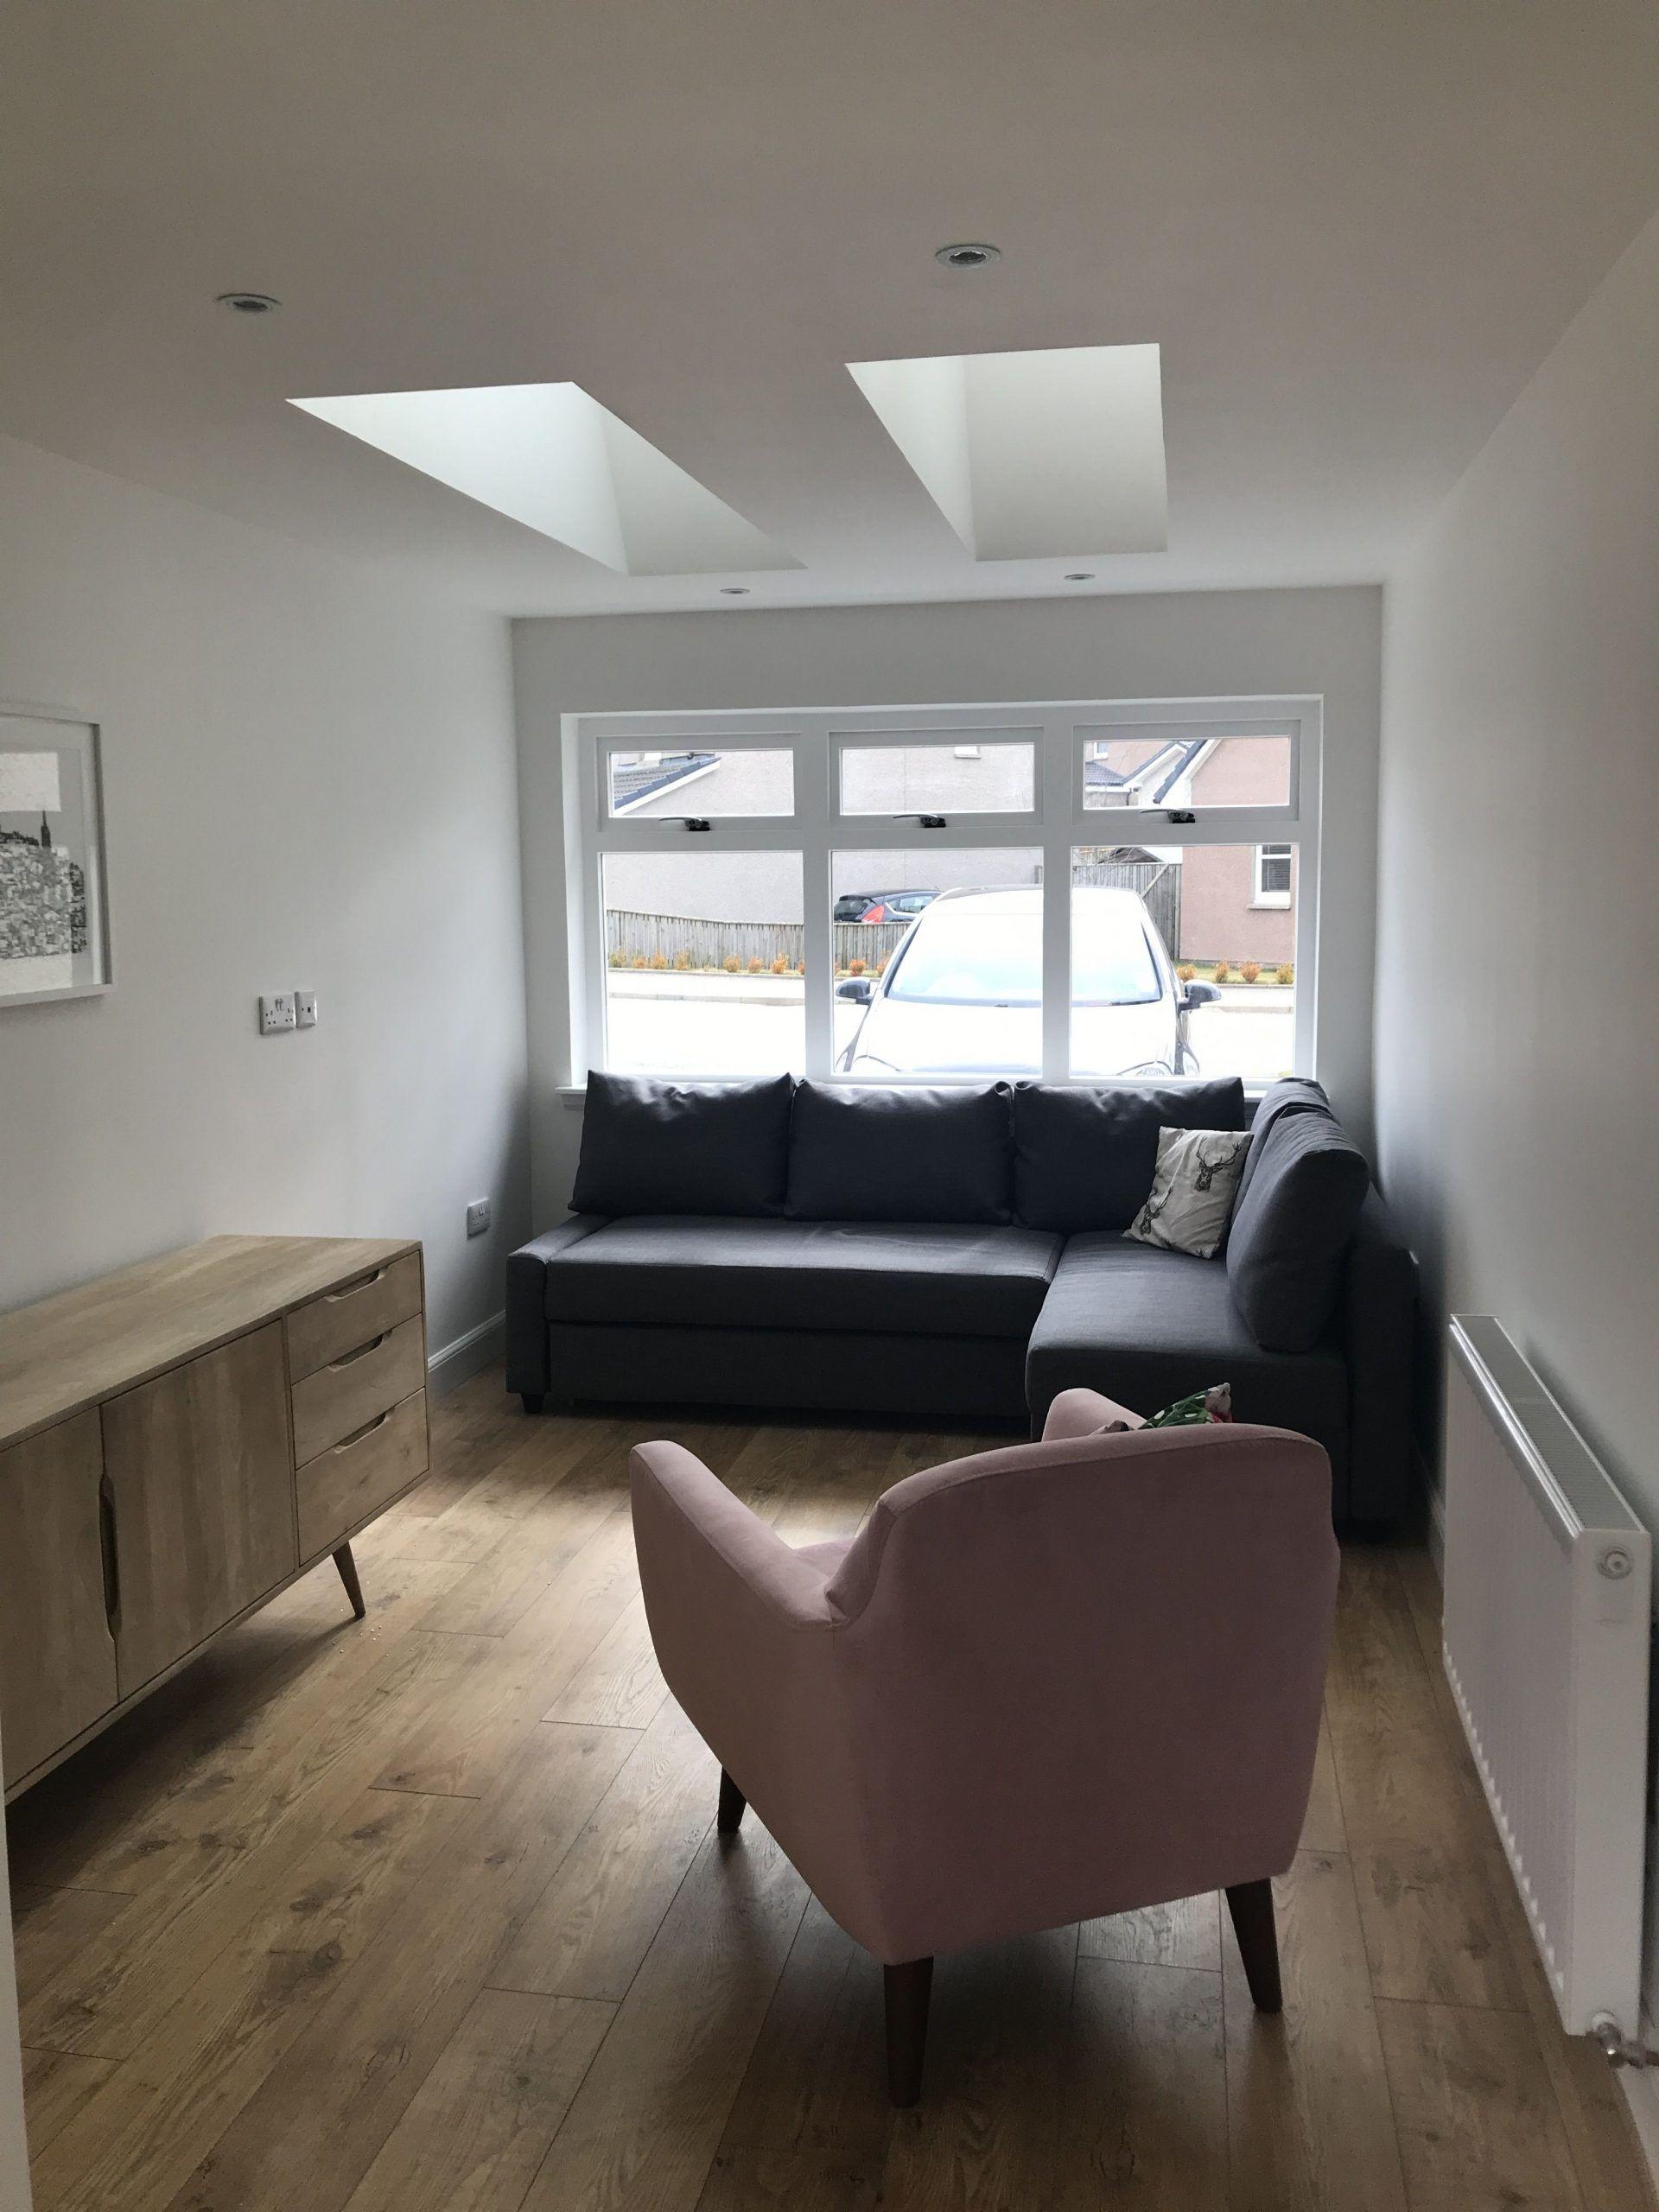 Single garage conversion. Extension. Ideas. Floor planning